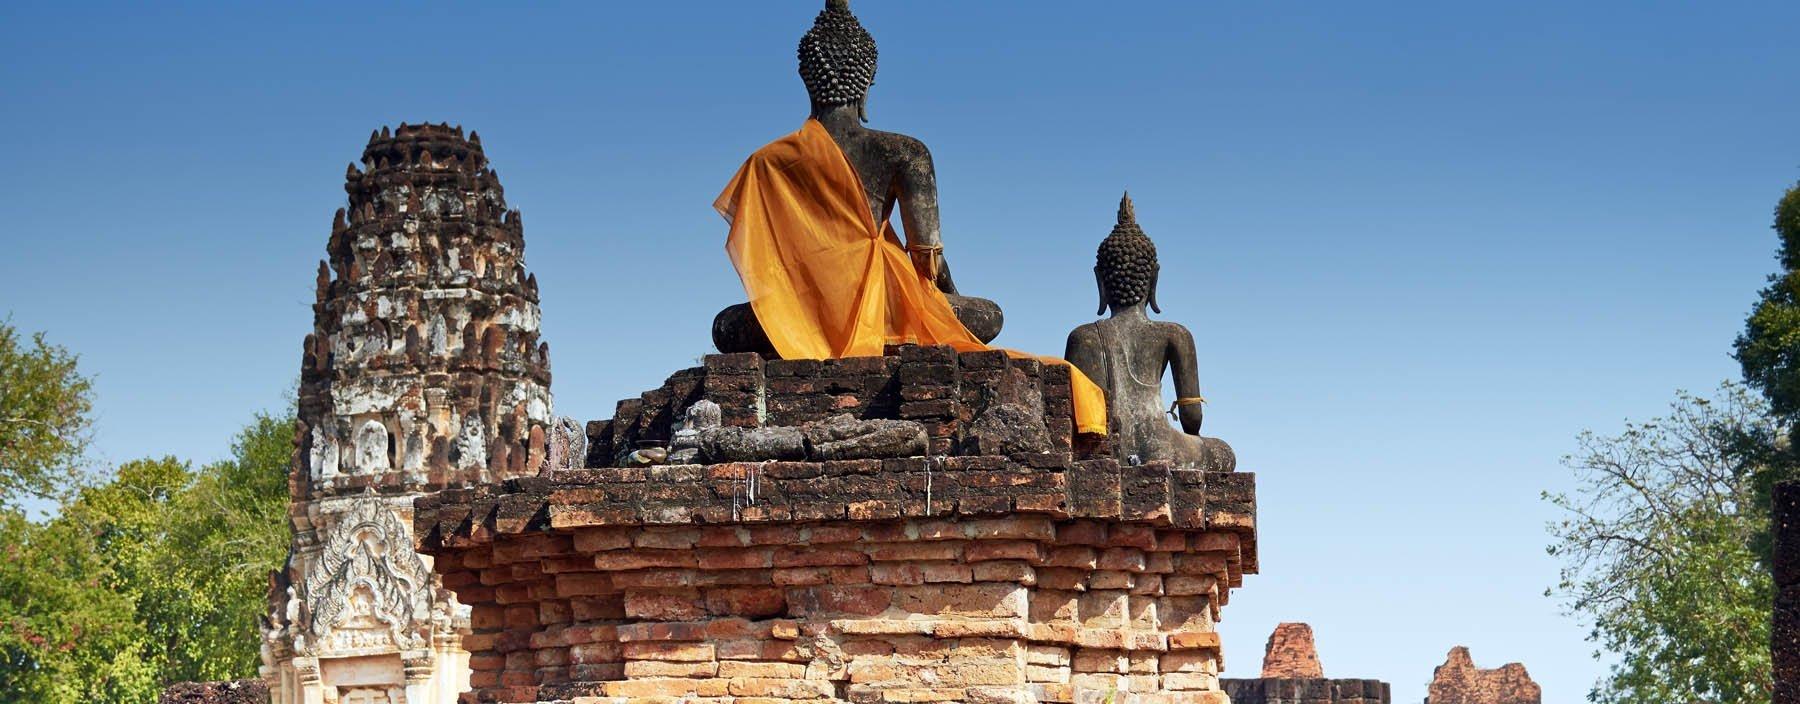 th, sukhothai, wat phra phai luang (2).jpg